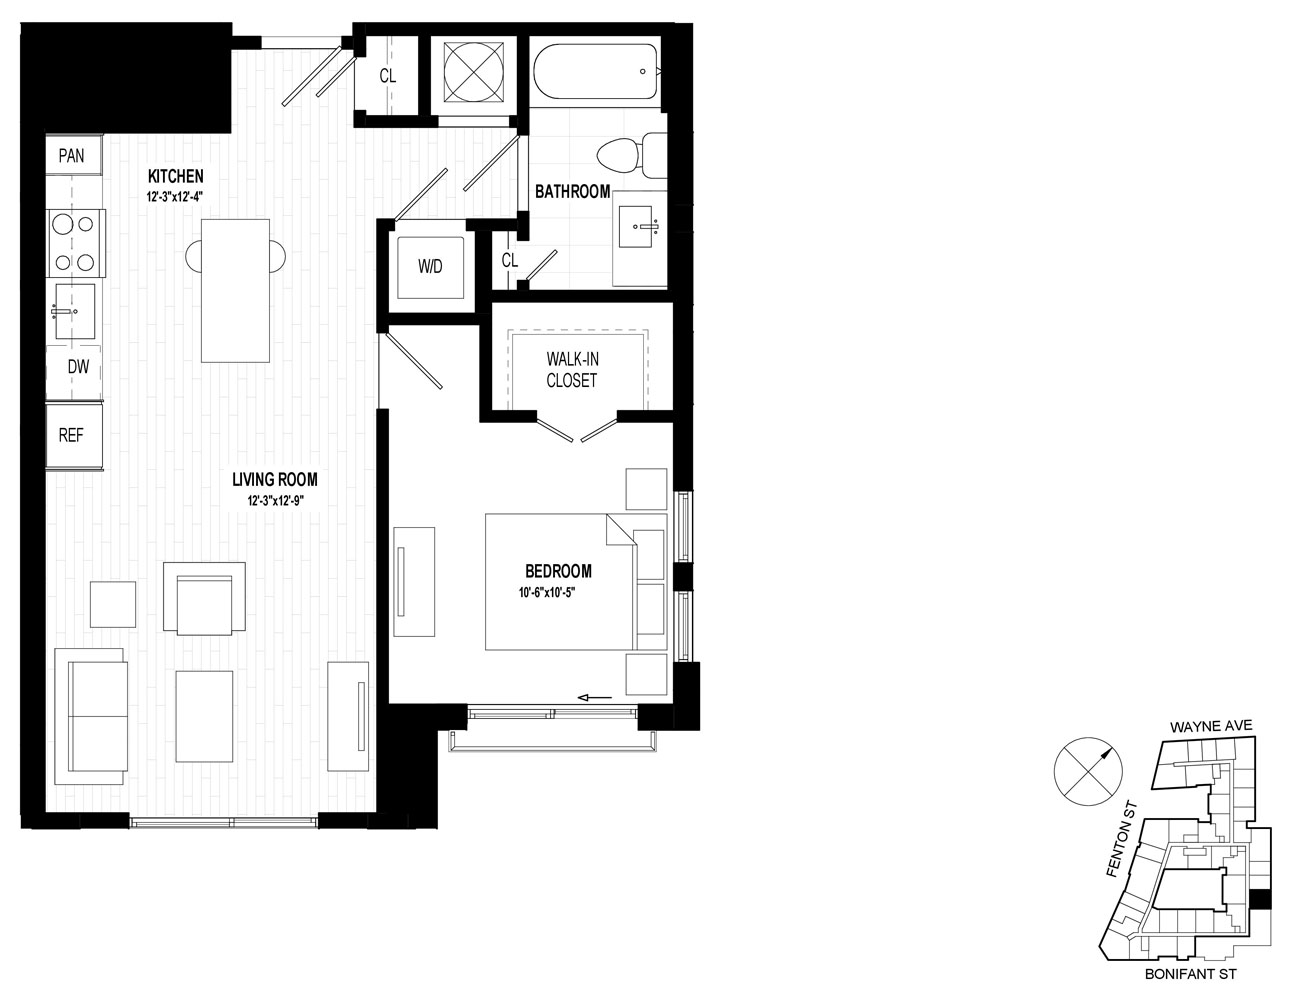 P0578887 761aa12 central a04d 645 2 floorplan